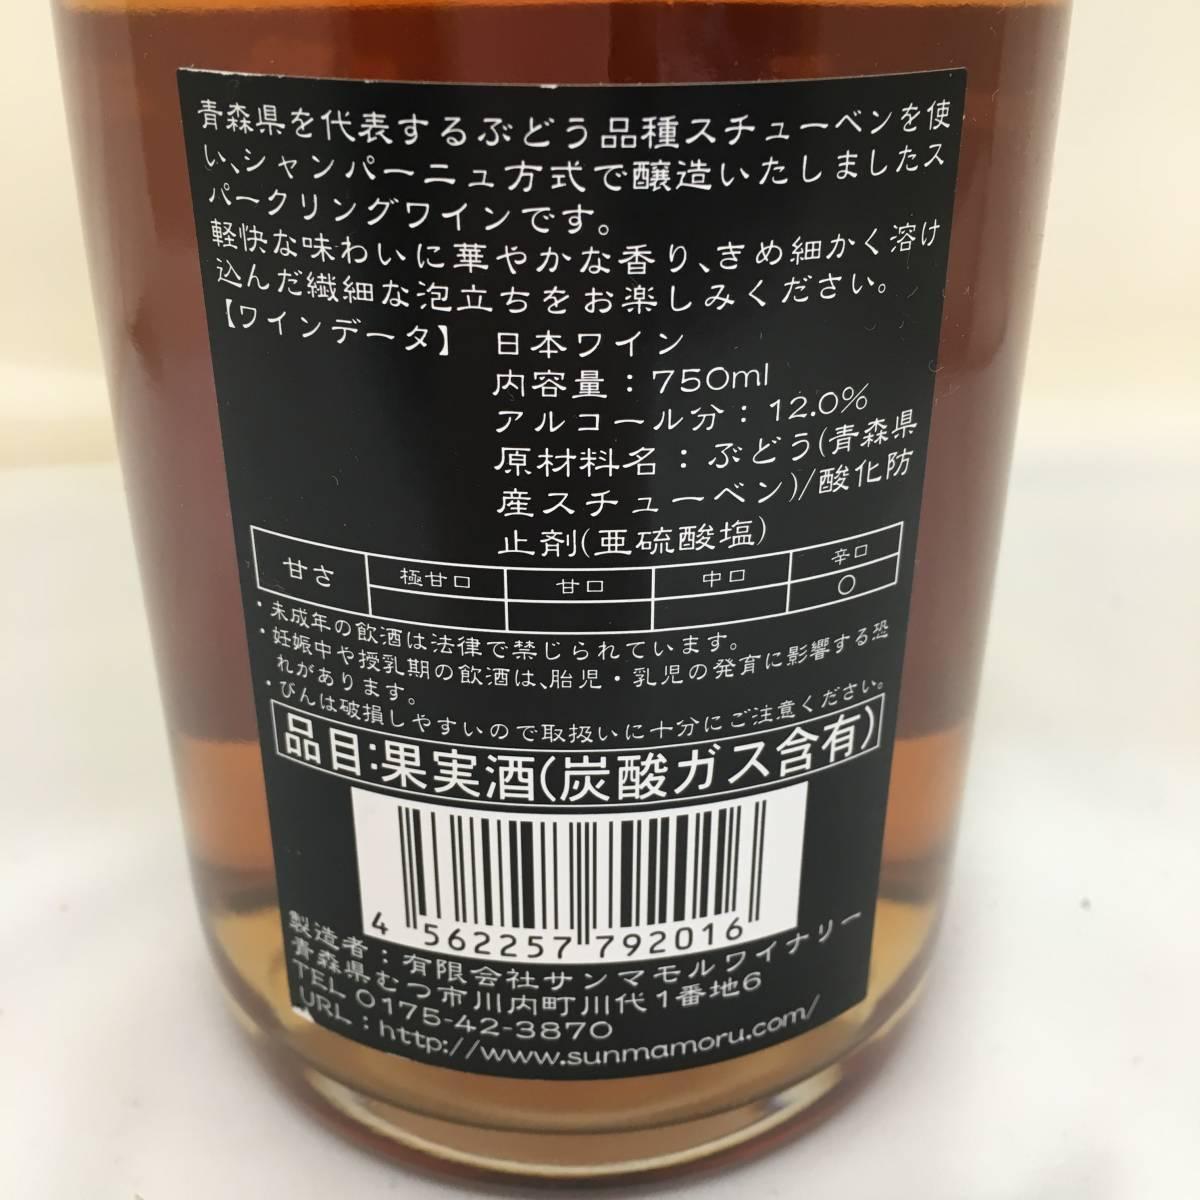 W180★【青森県在住の方限定】青森 ロゼスパークリングワイン 750ml 12%_画像5